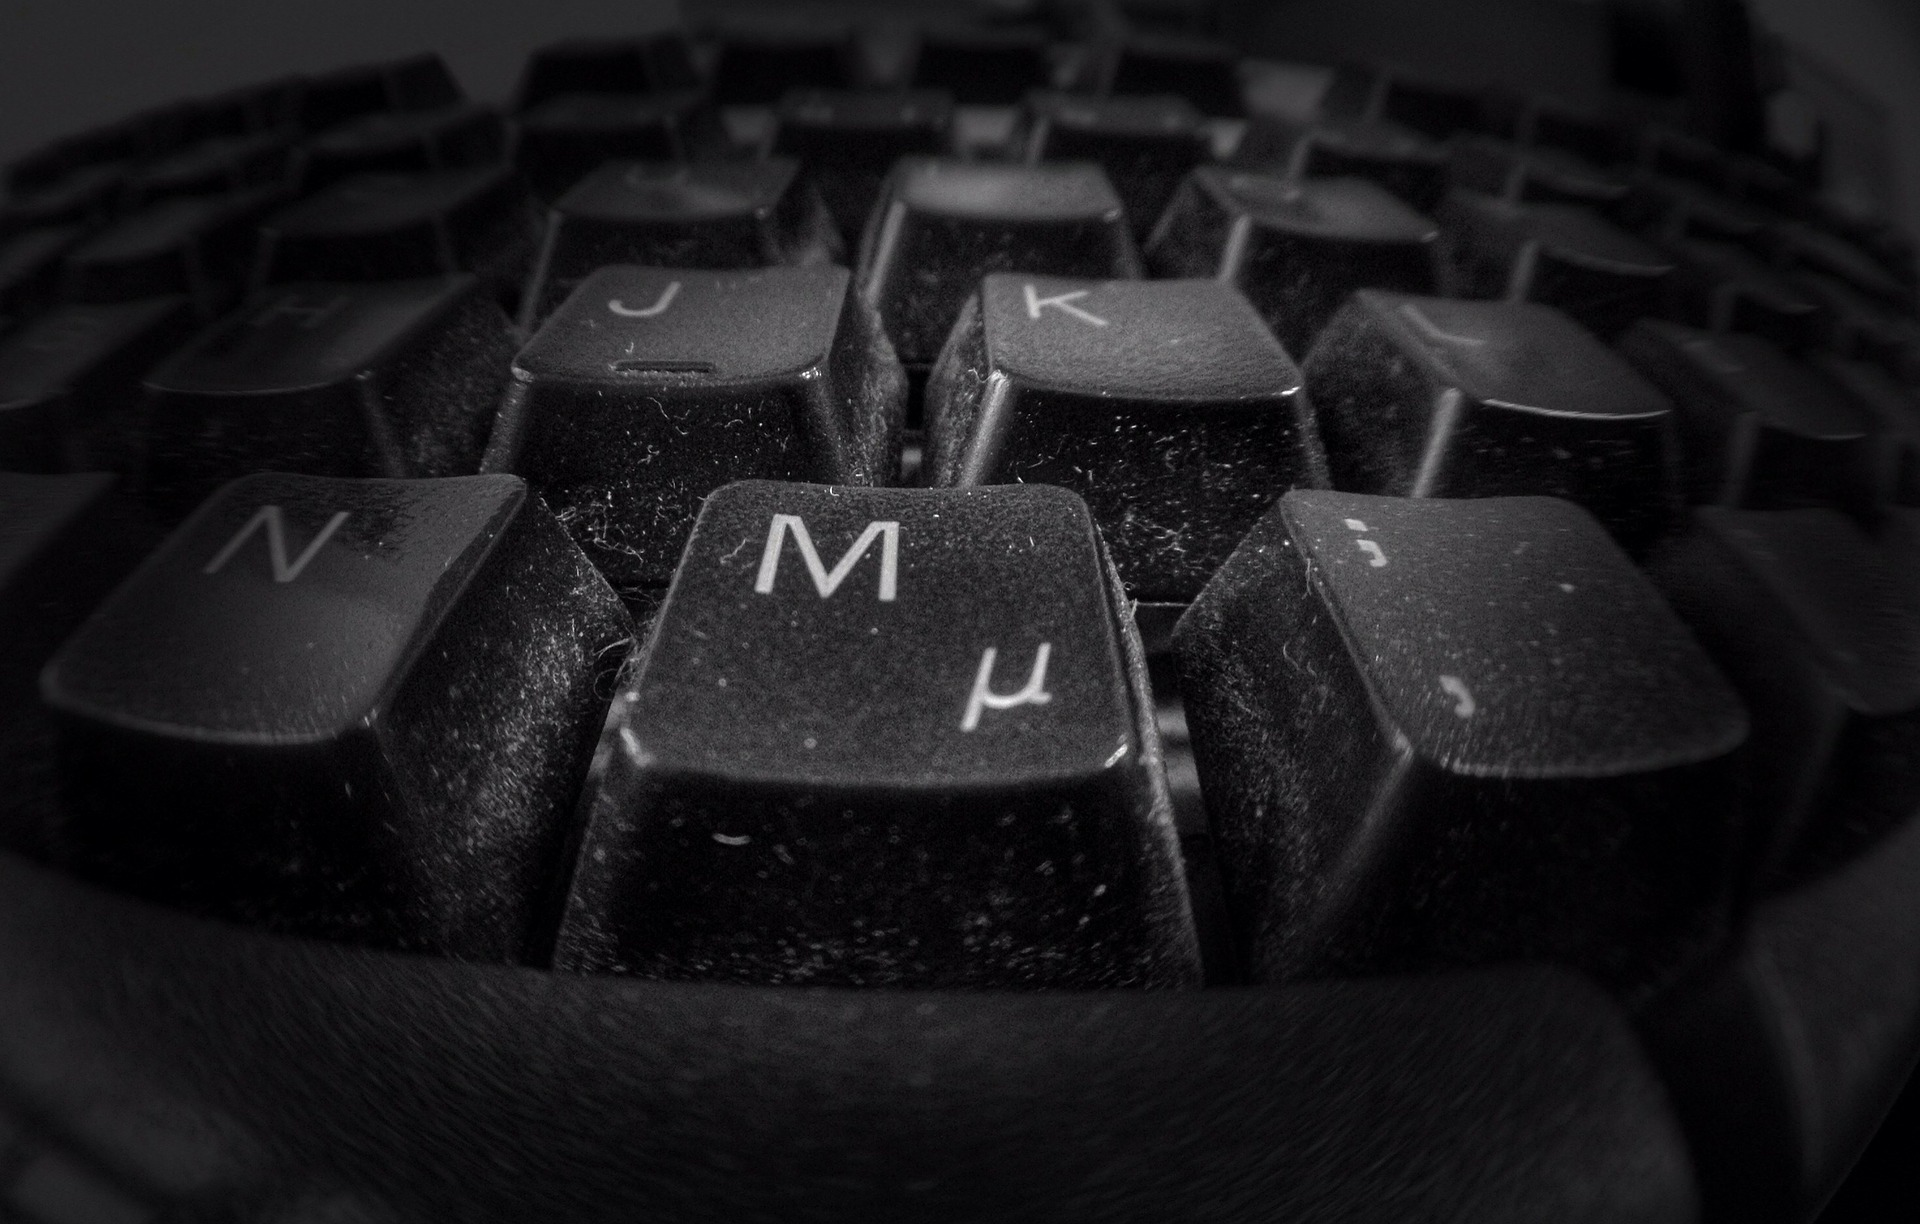 Keyboard 277799 1920